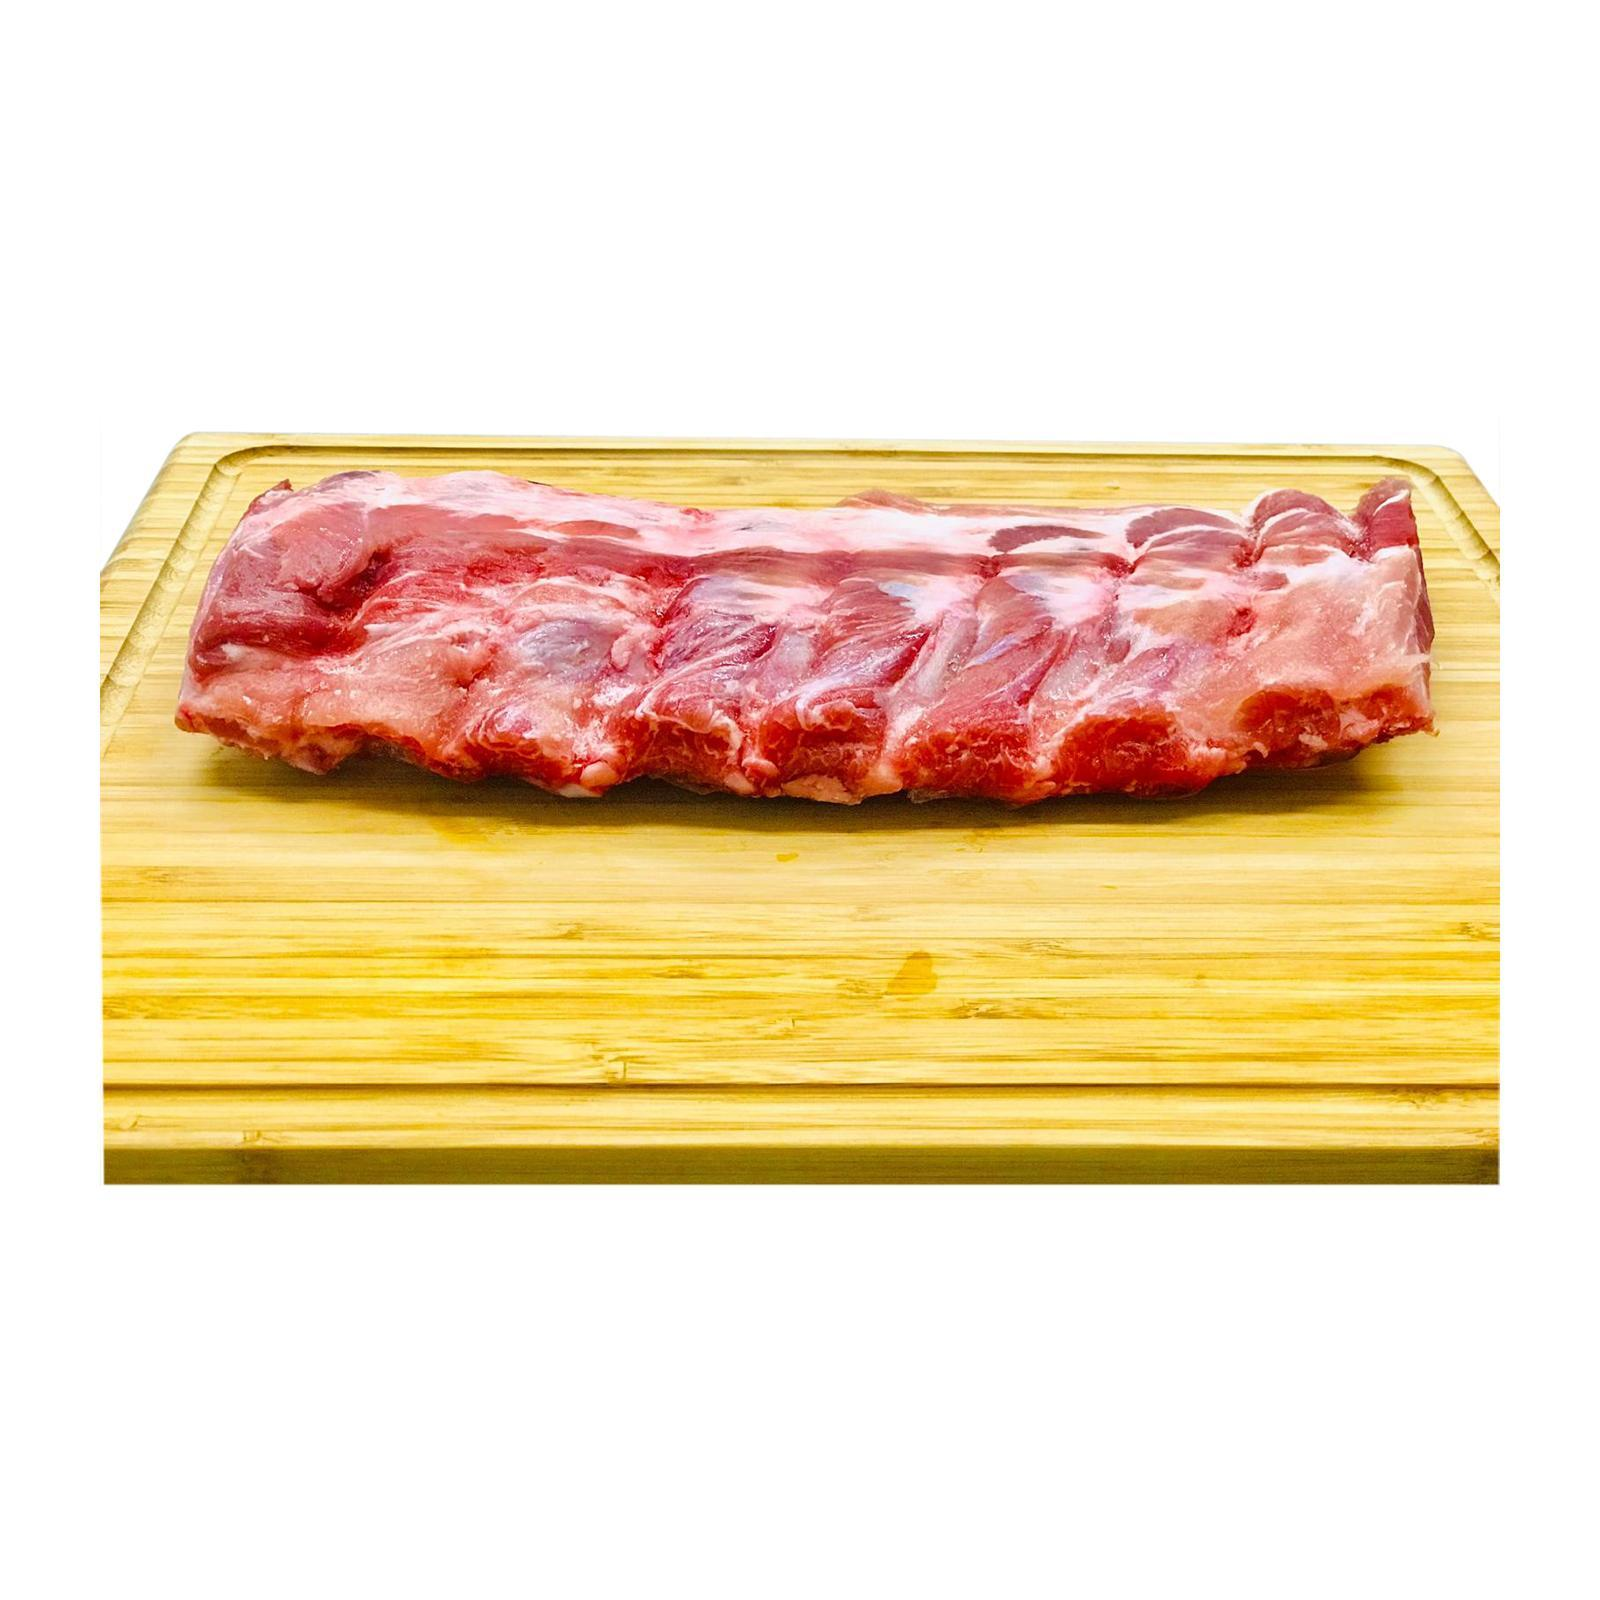 Master Grocer Pork Baby Back Ribs - Frozen